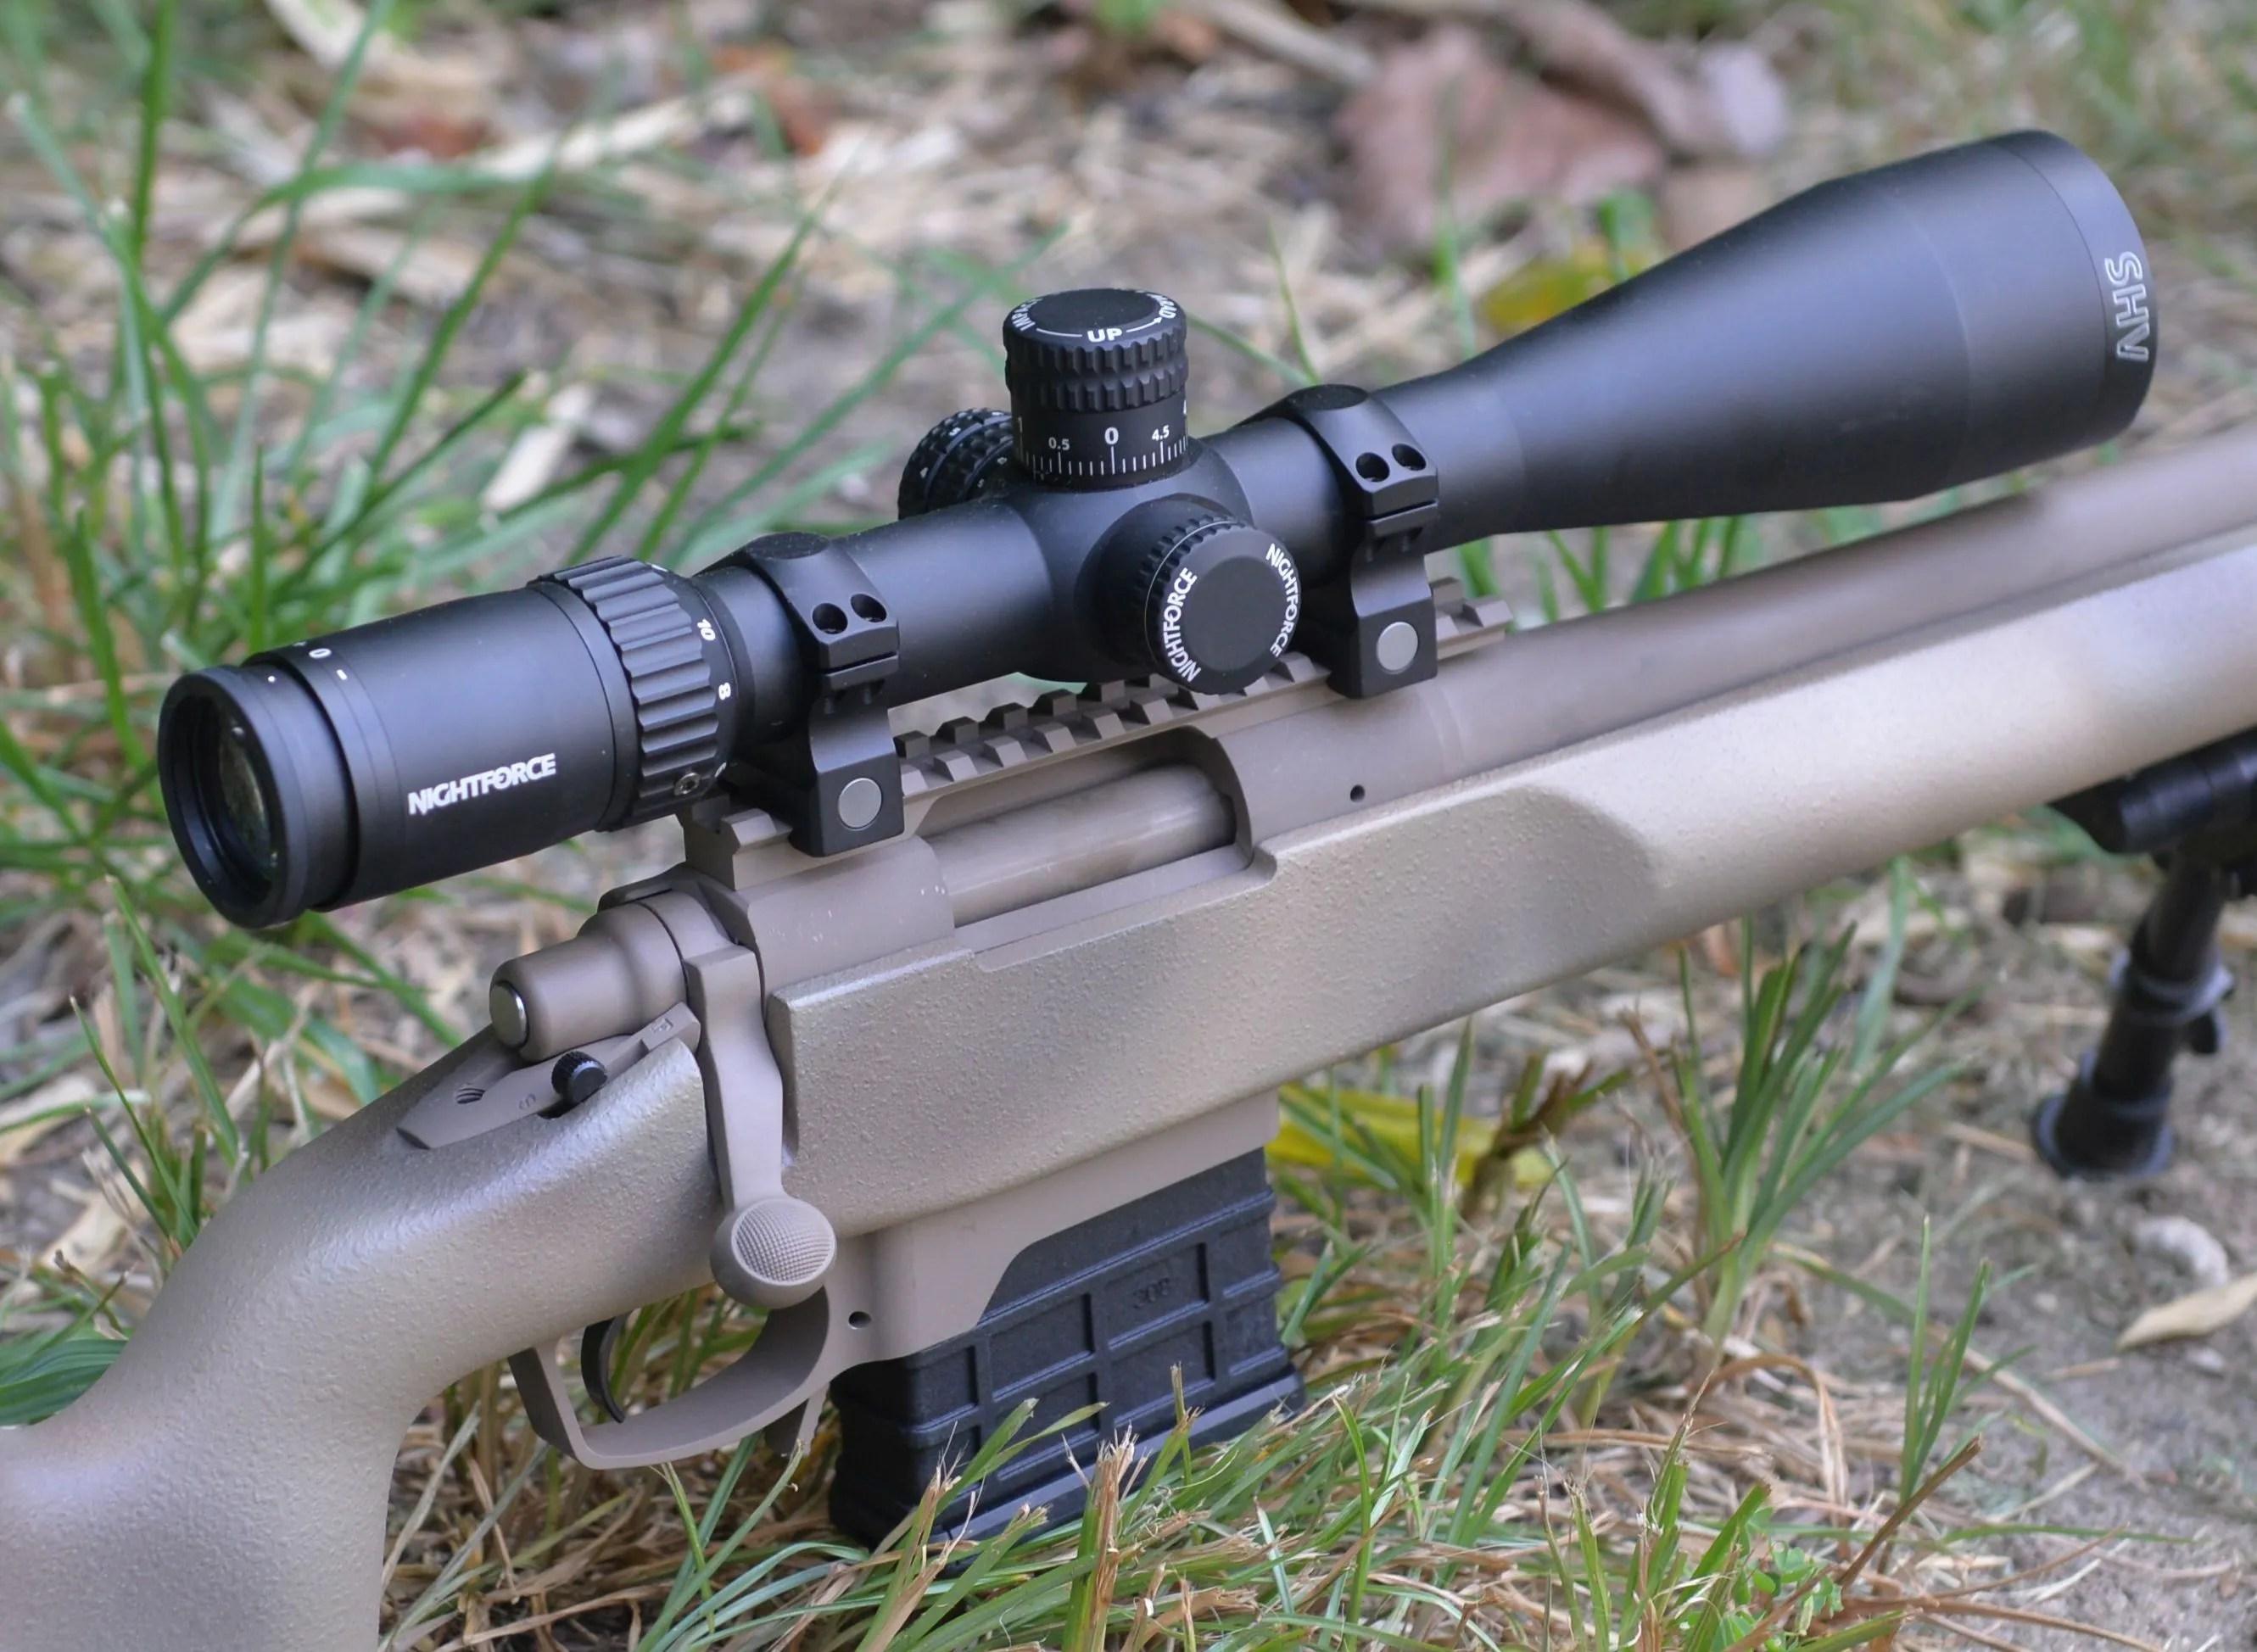 Remington 700 SPS 243 Win to 6 Creedmoor conversion: Budget